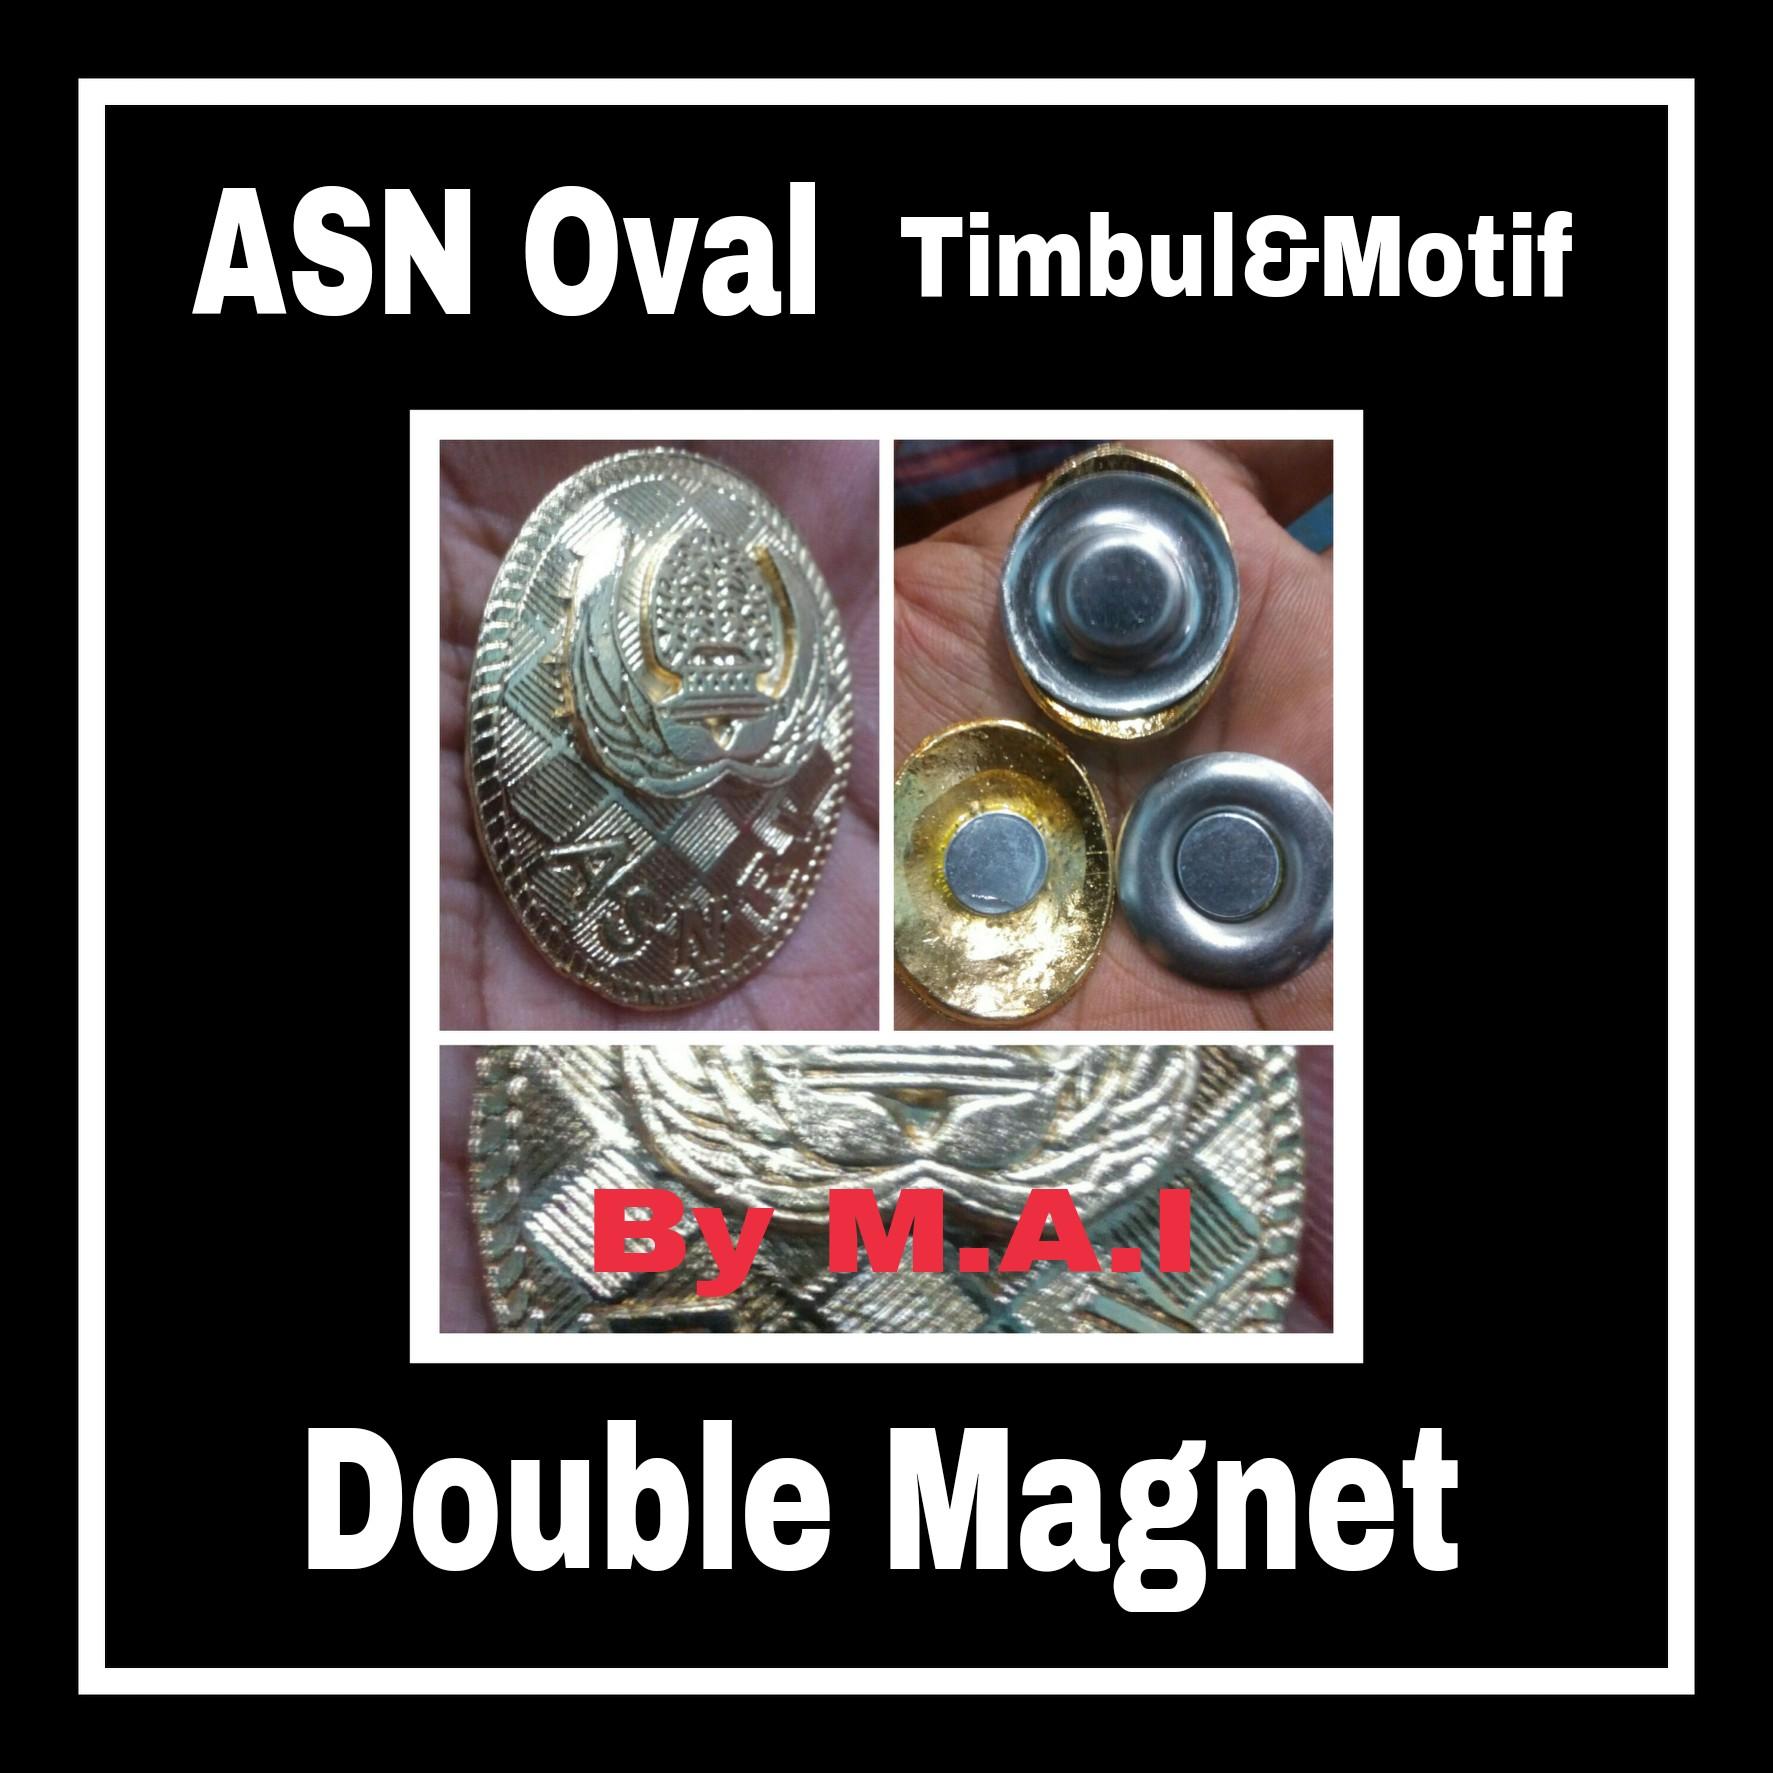 ASN Oval Timbul